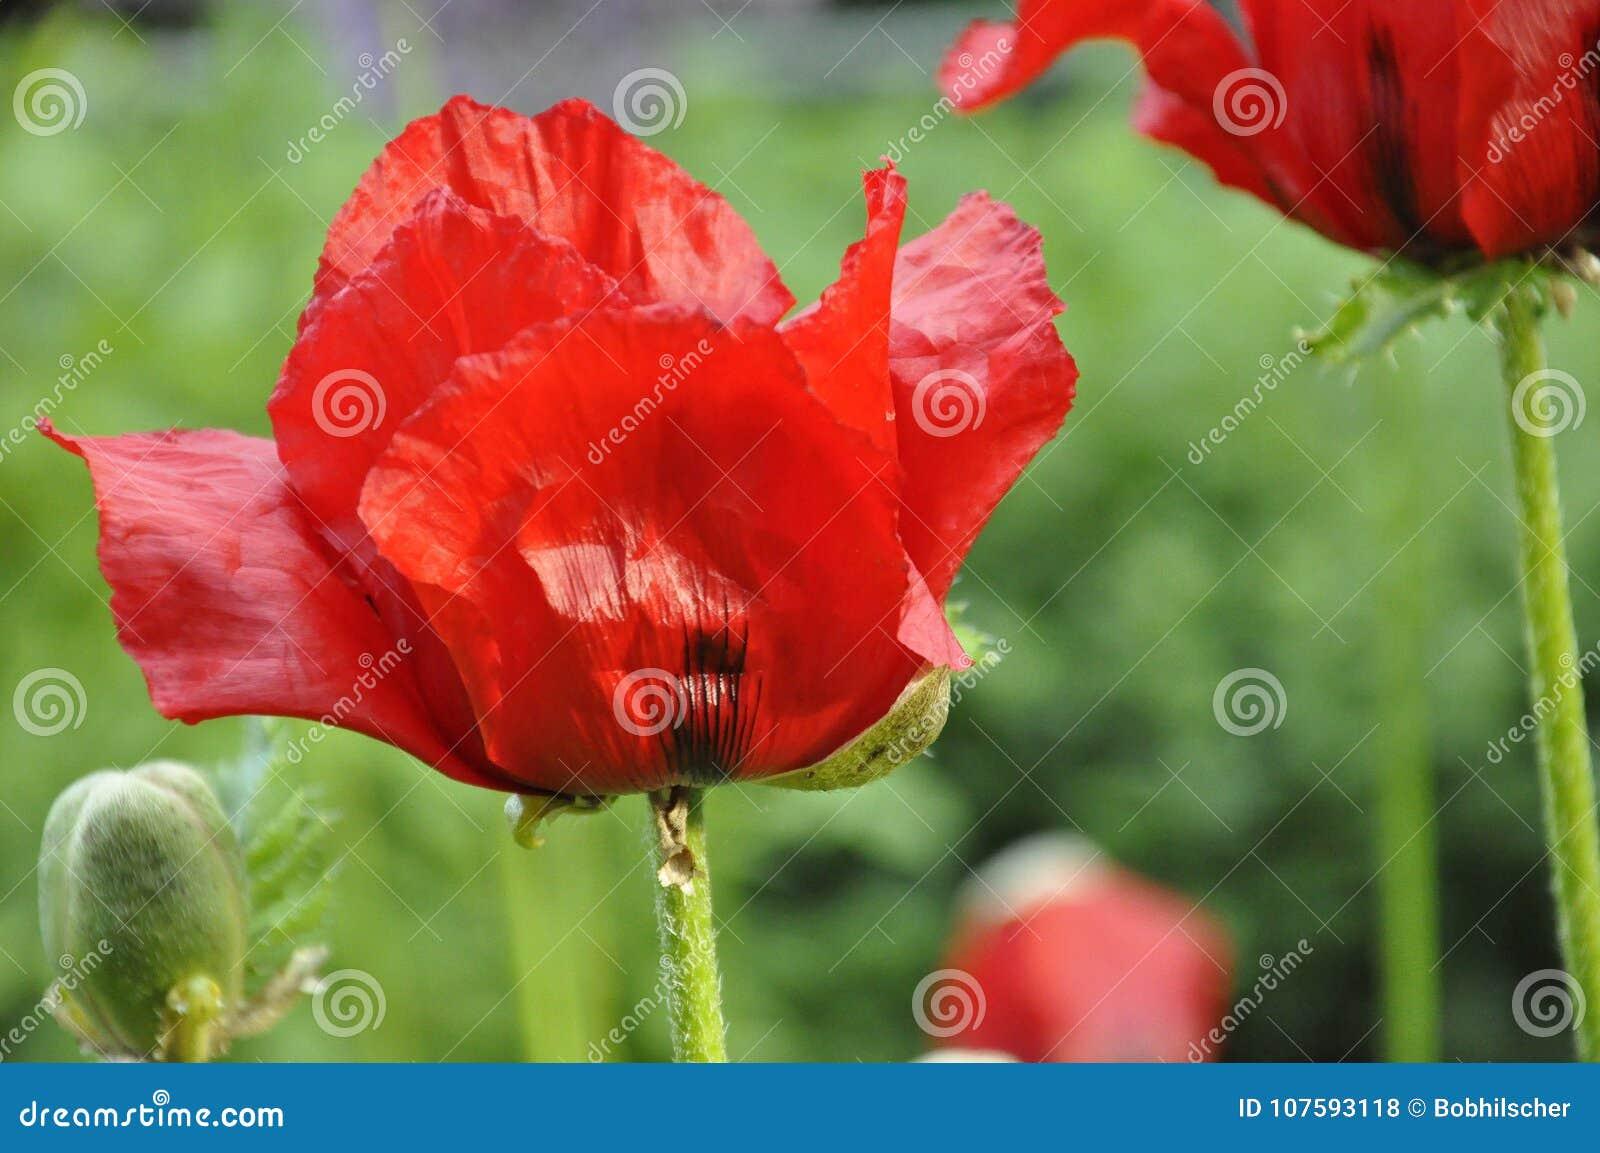 Red Oriental Poppy Flowers Stock Photo Image Of Botanical 107593118